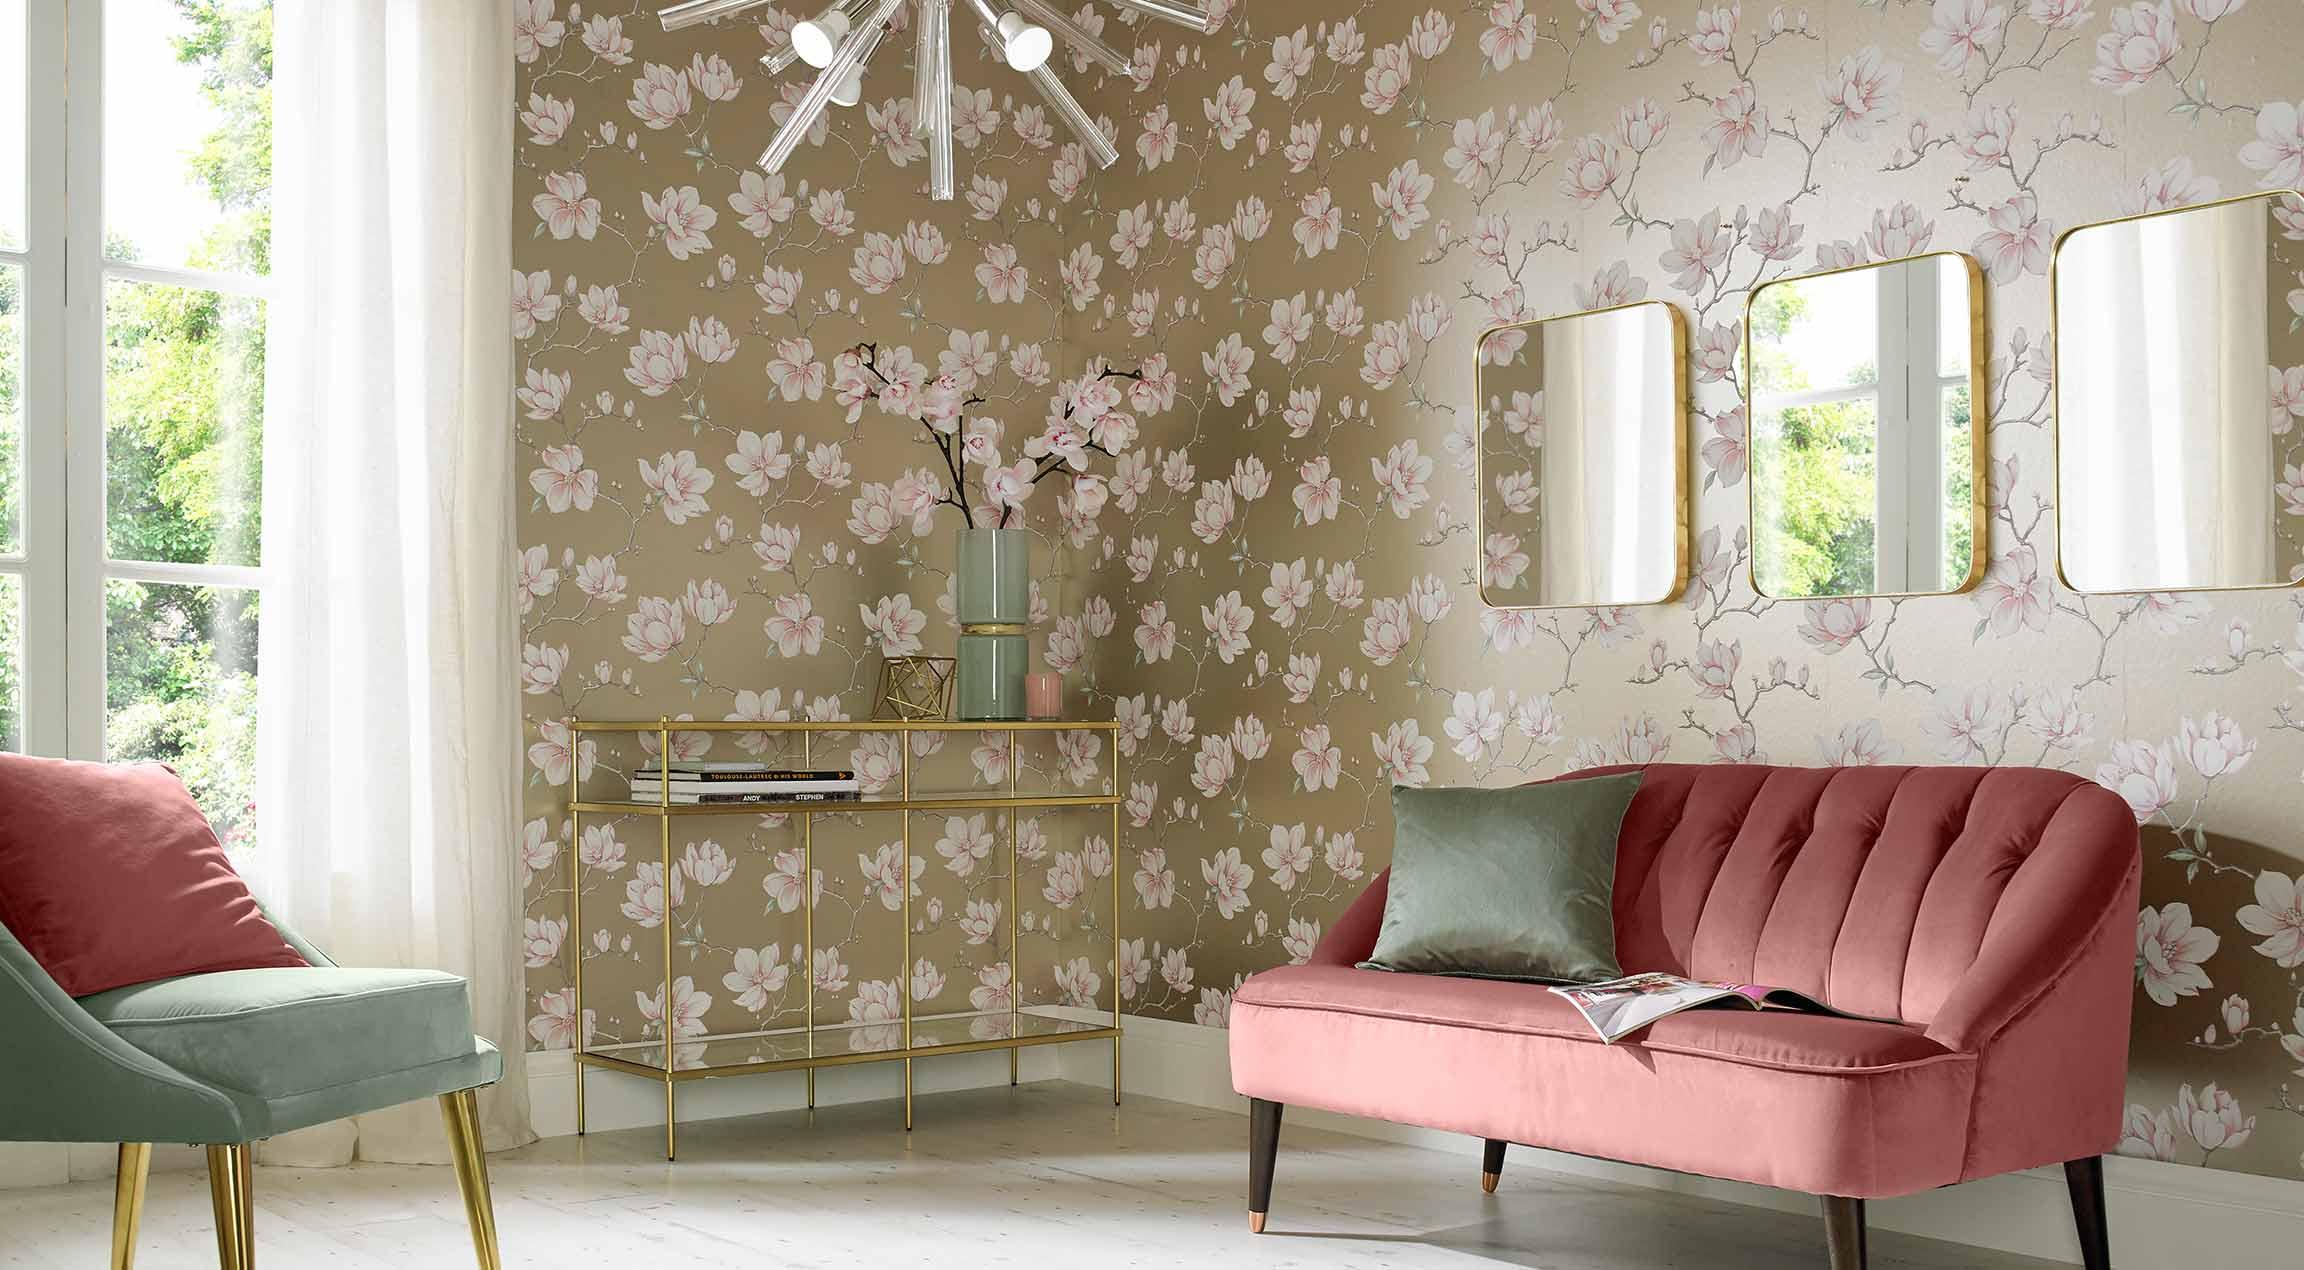 wallpapers for living room images,furniture,living room,room,interior design,green